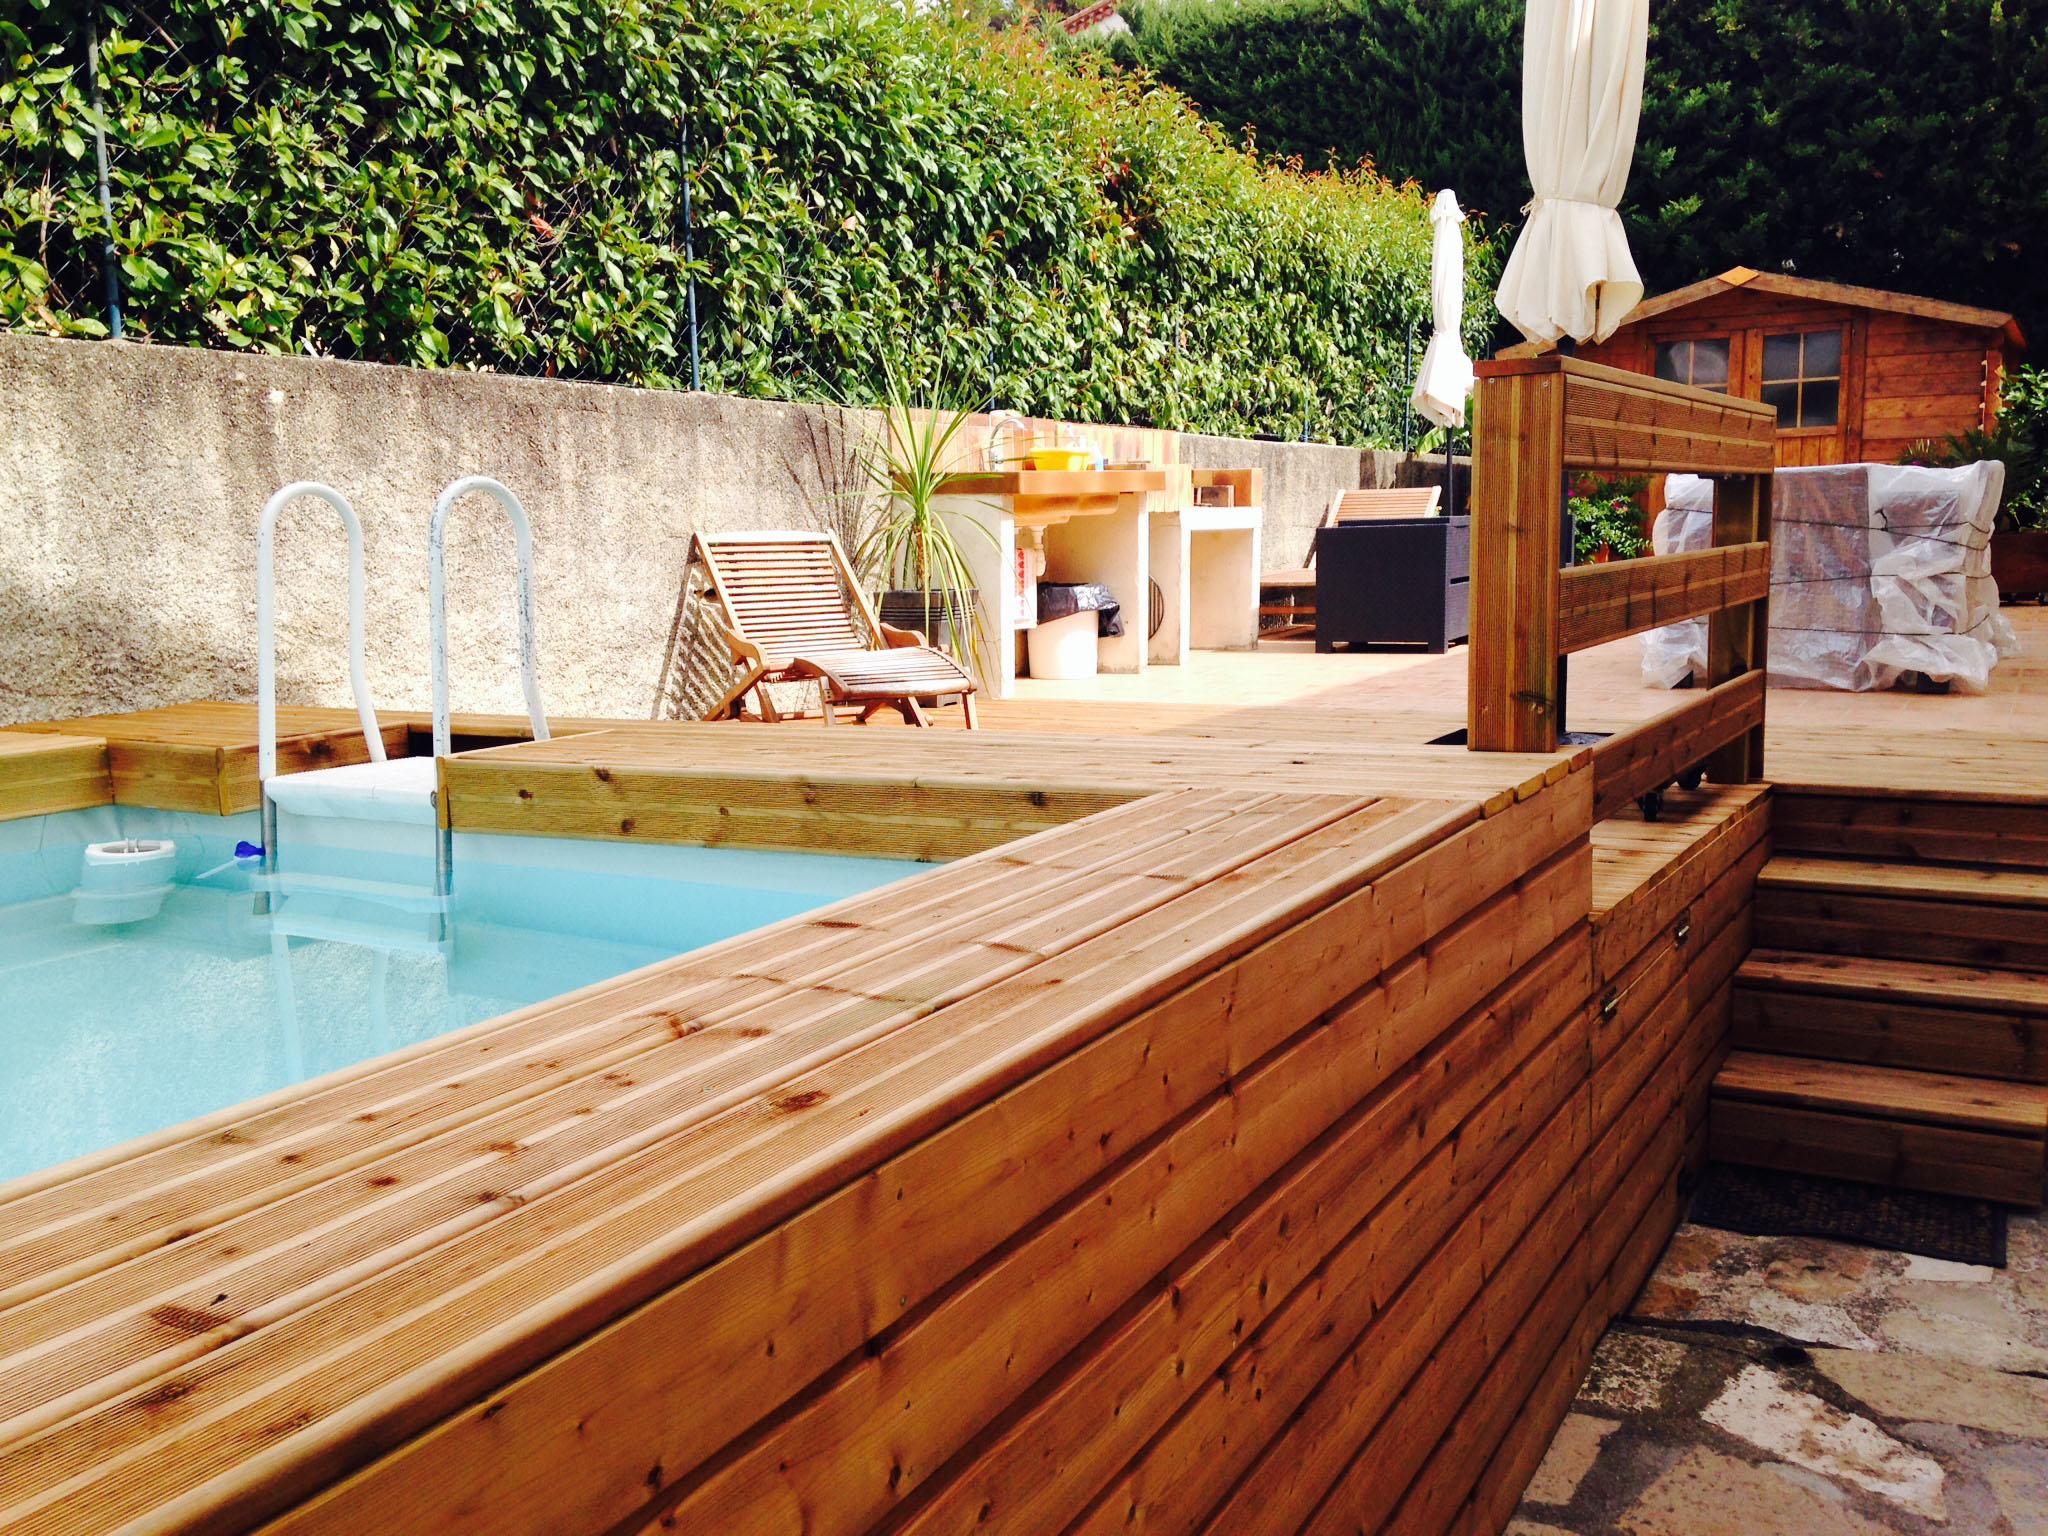 comment habiller ma piscine laghetto tubulaire. Black Bedroom Furniture Sets. Home Design Ideas